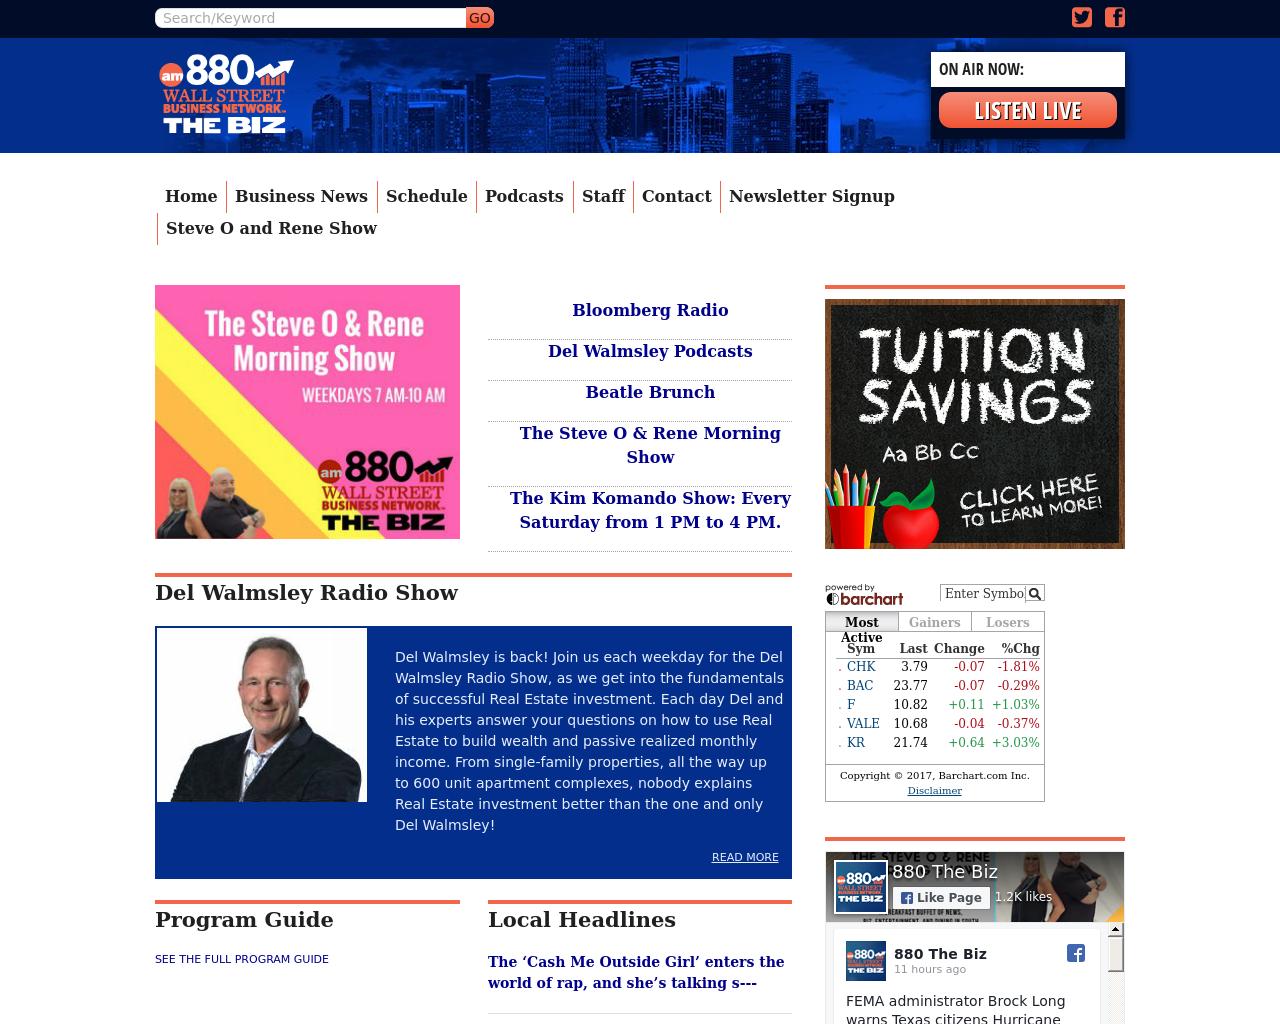 Townhall-Media-Kit-Advertising-Reviews-Pricing